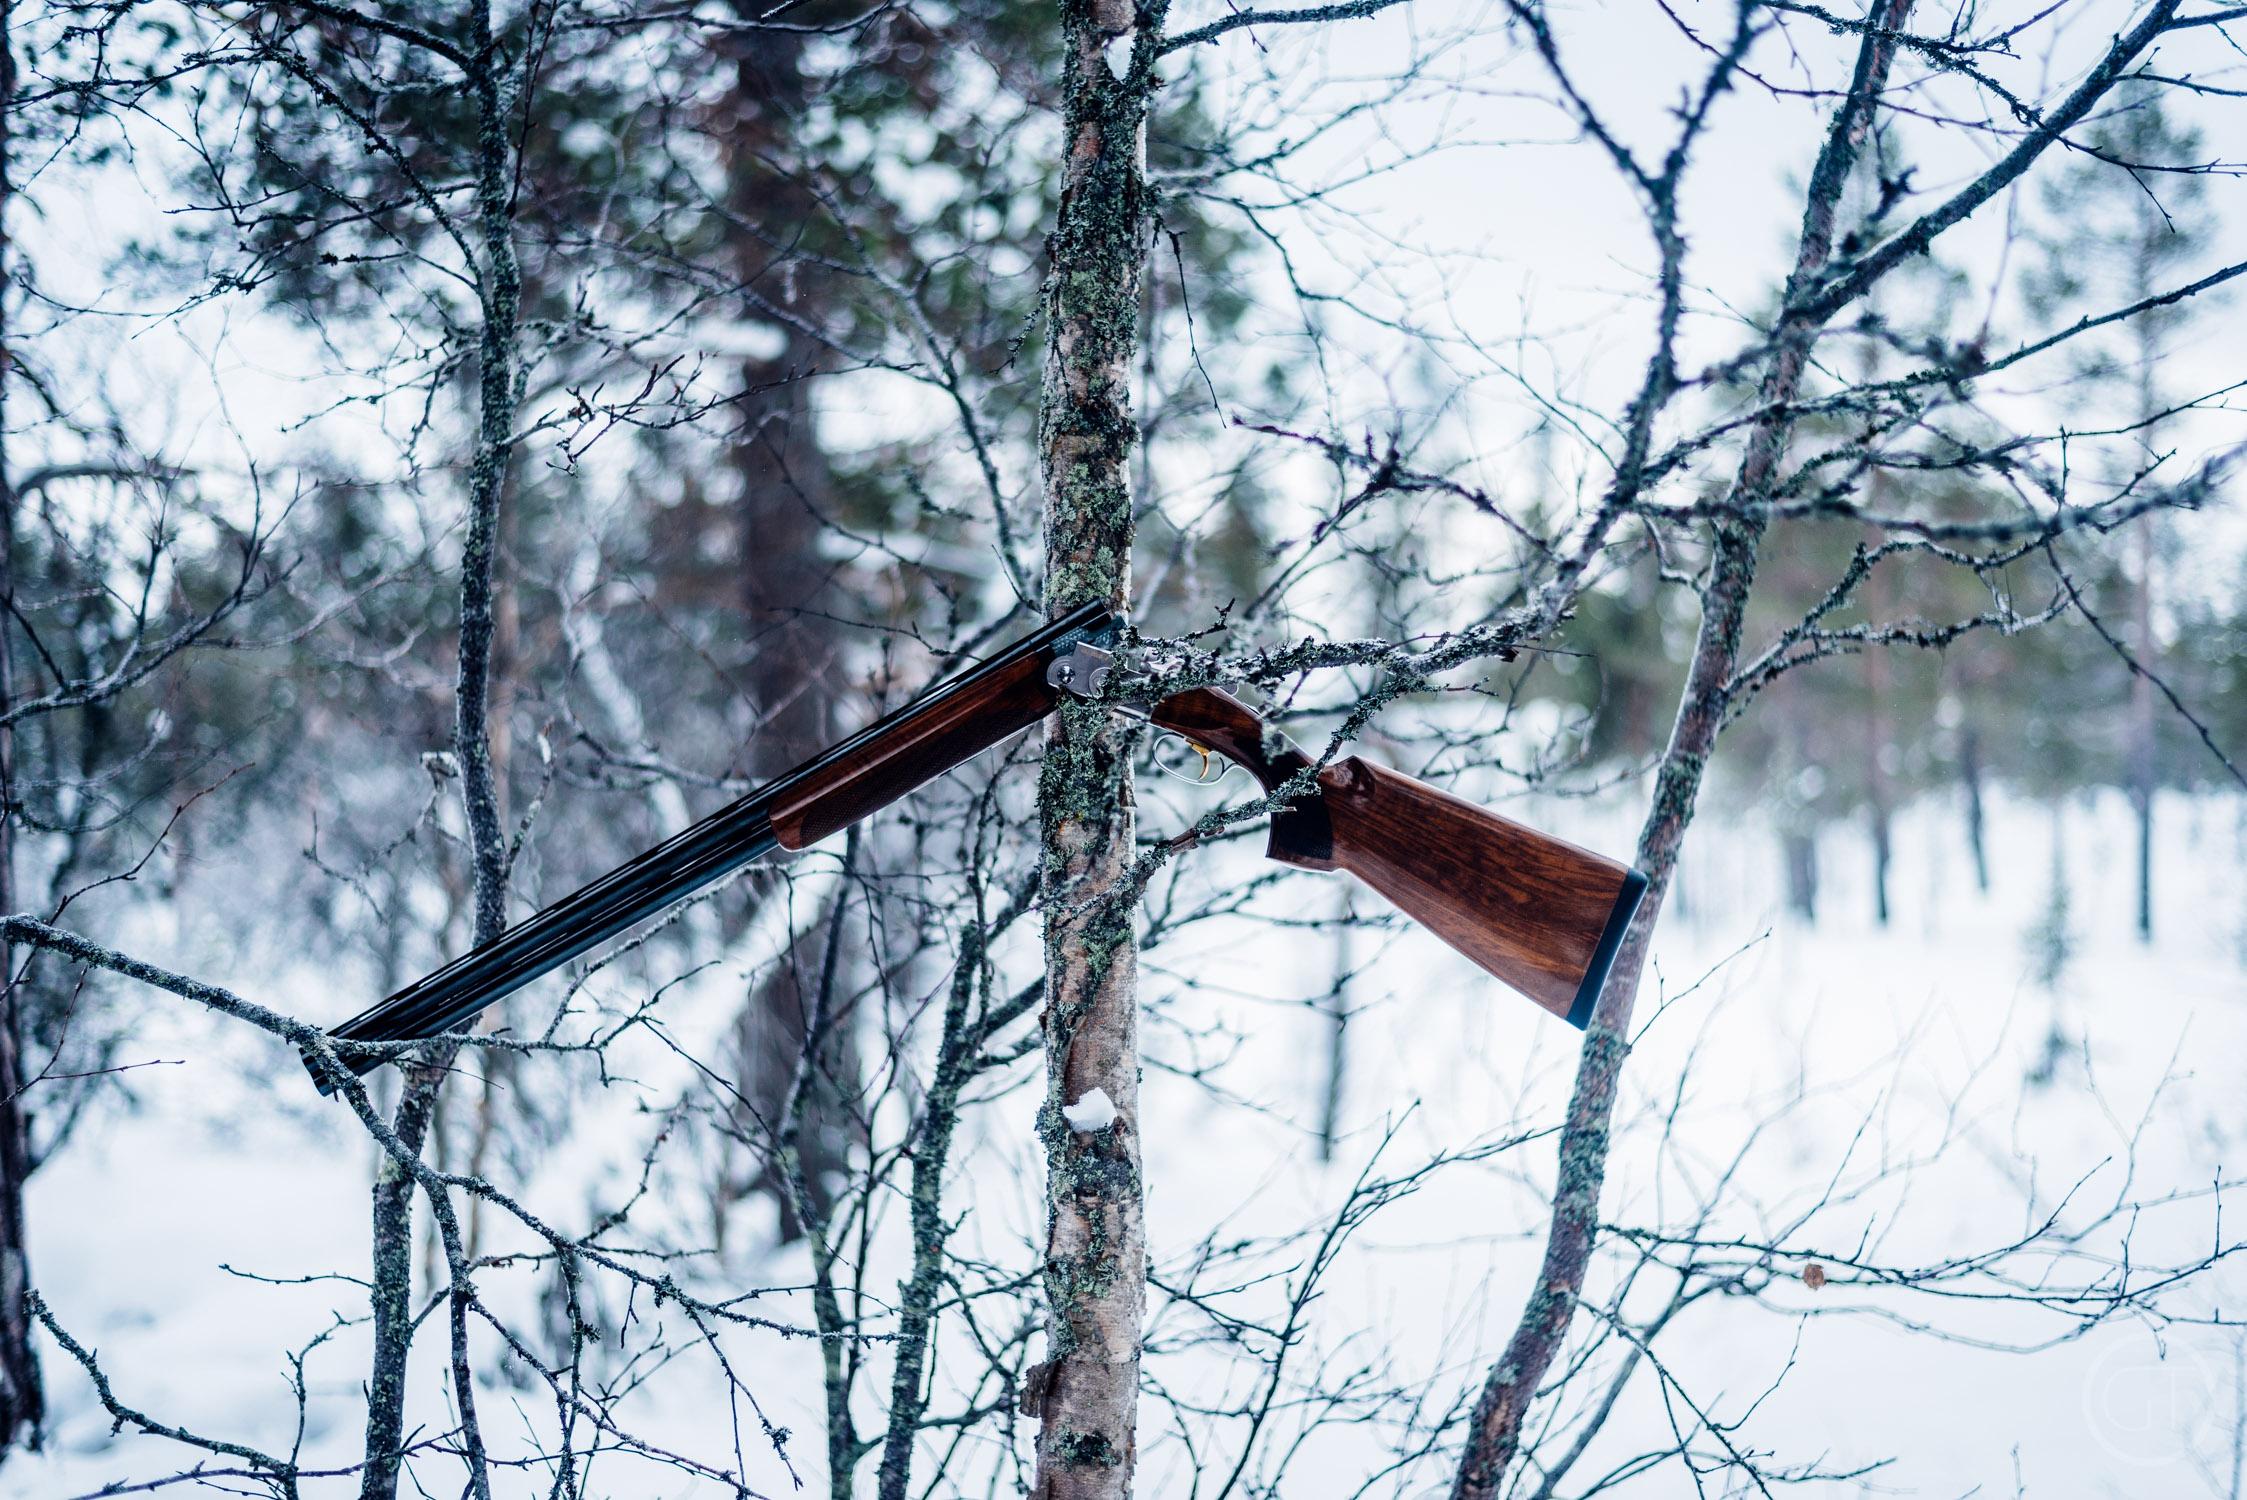 GUSTAV_THUESEN_HUNTING_NORWAY_OUTDOOR_LIFESTYLE_PHOTOGRAPHER_PROFESSIONAL-27.jpg